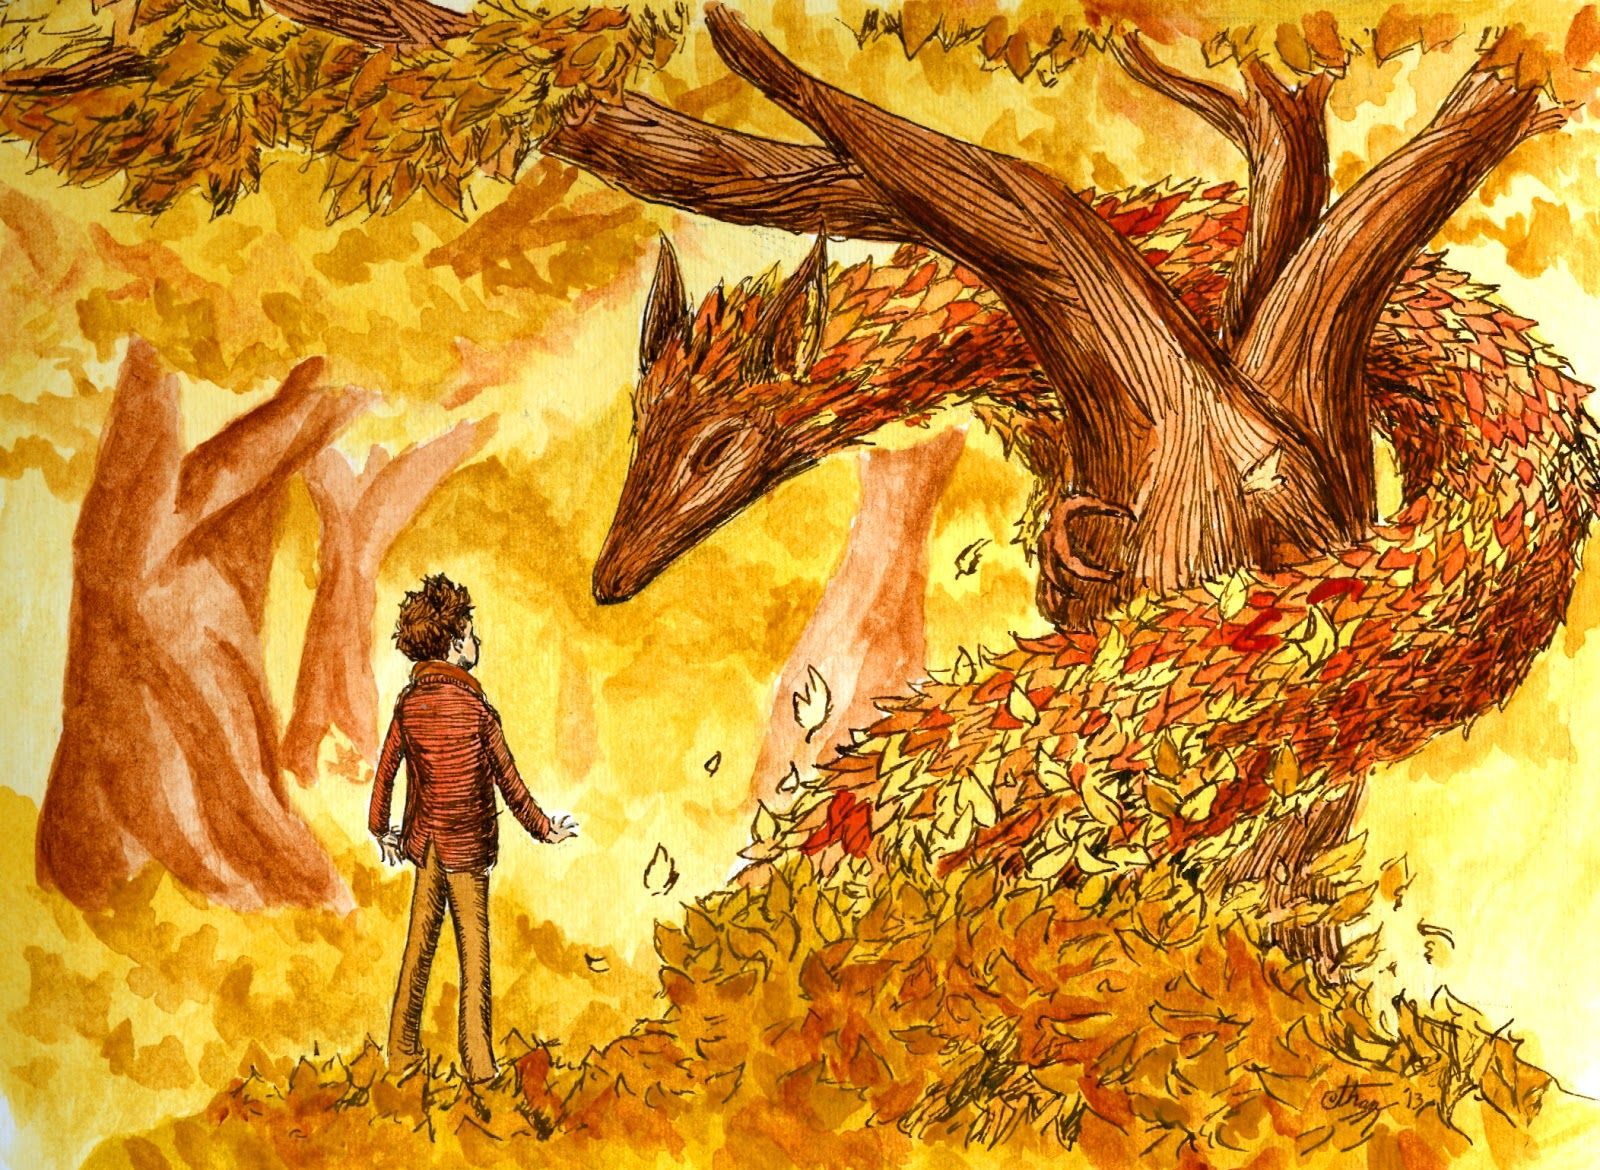 The Art of Ethan Aldridge The Autumn Dragon Autumn art